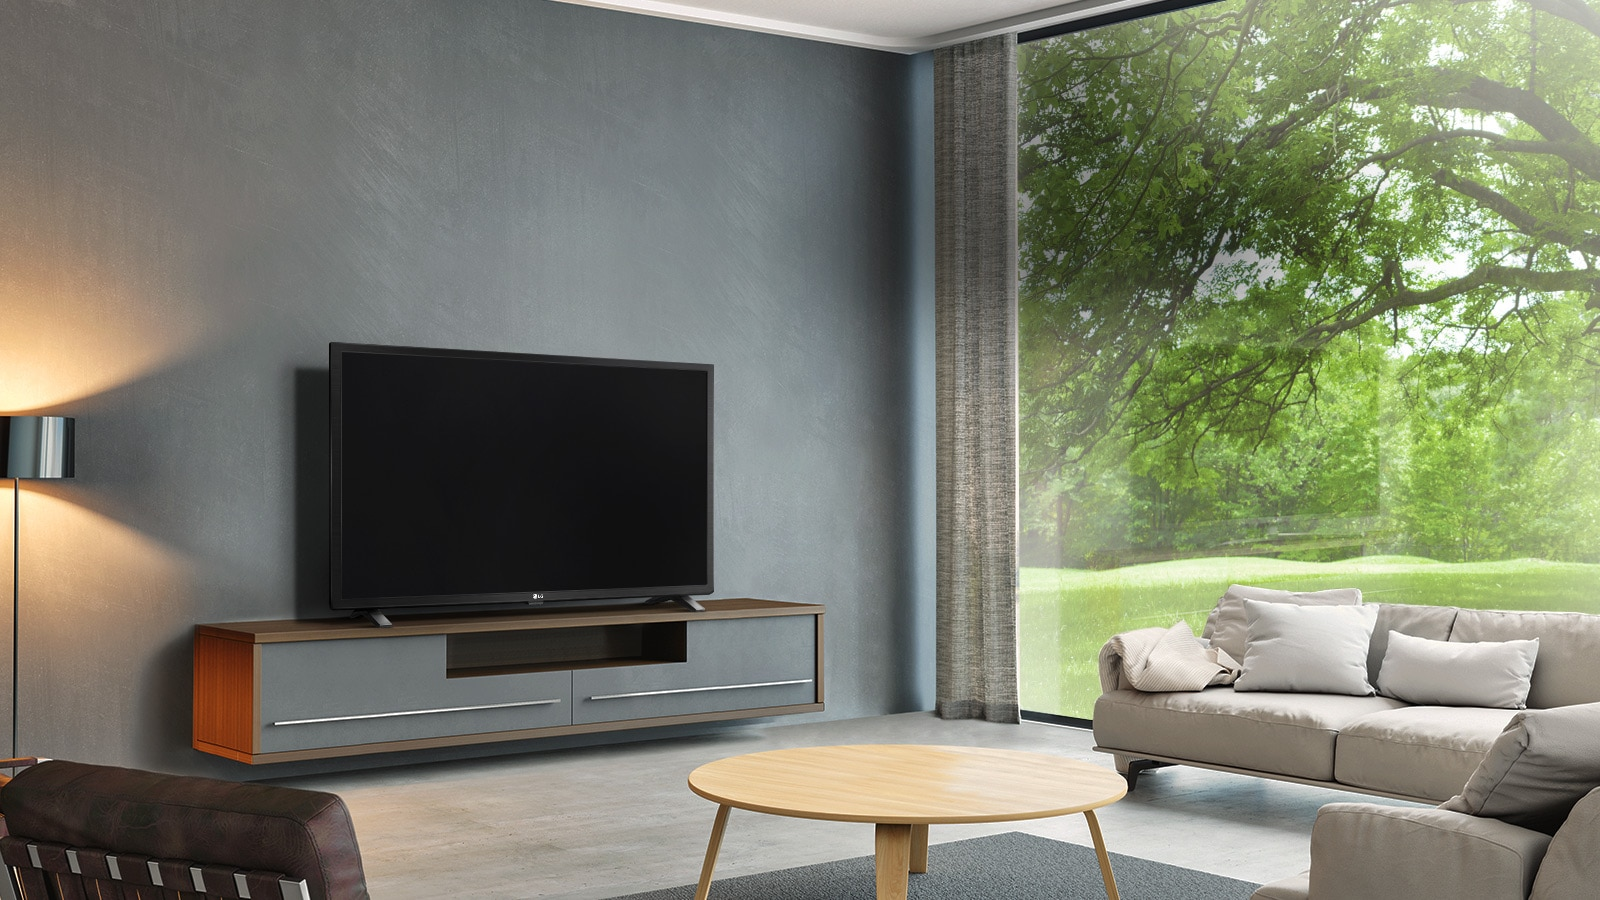 TV-FHD-32-LM63-10-Design-Desktop